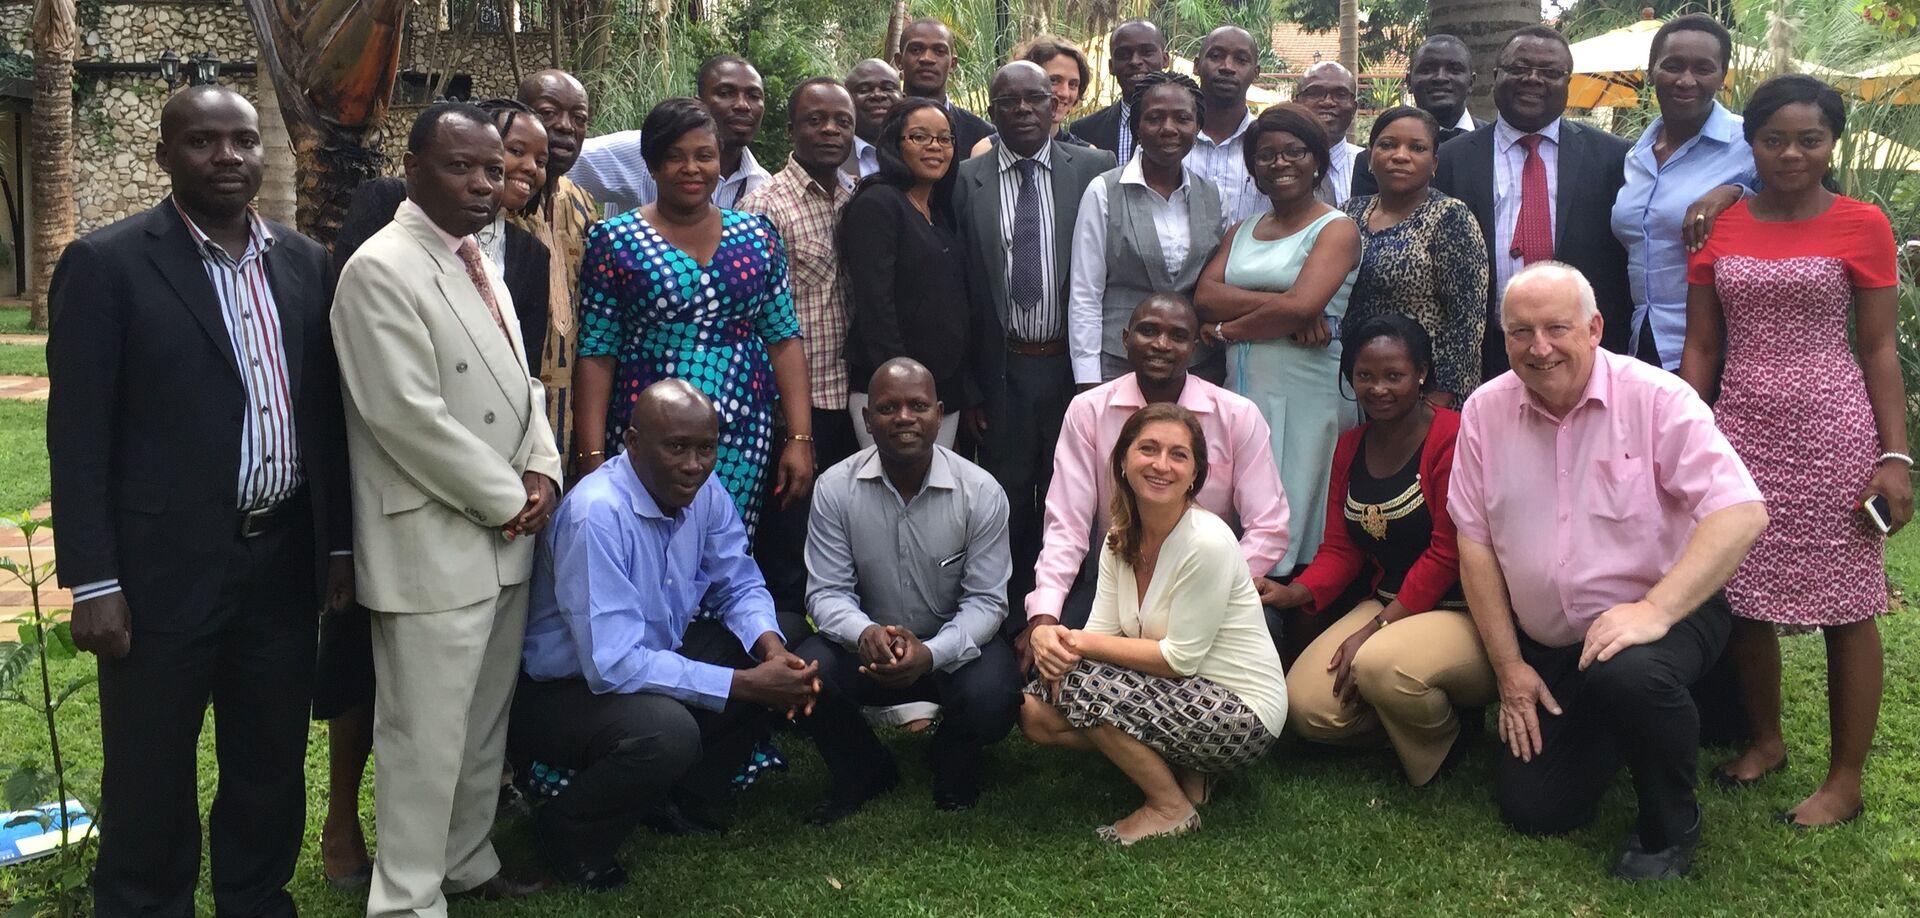 FKE:  Federation of Kenya Employers